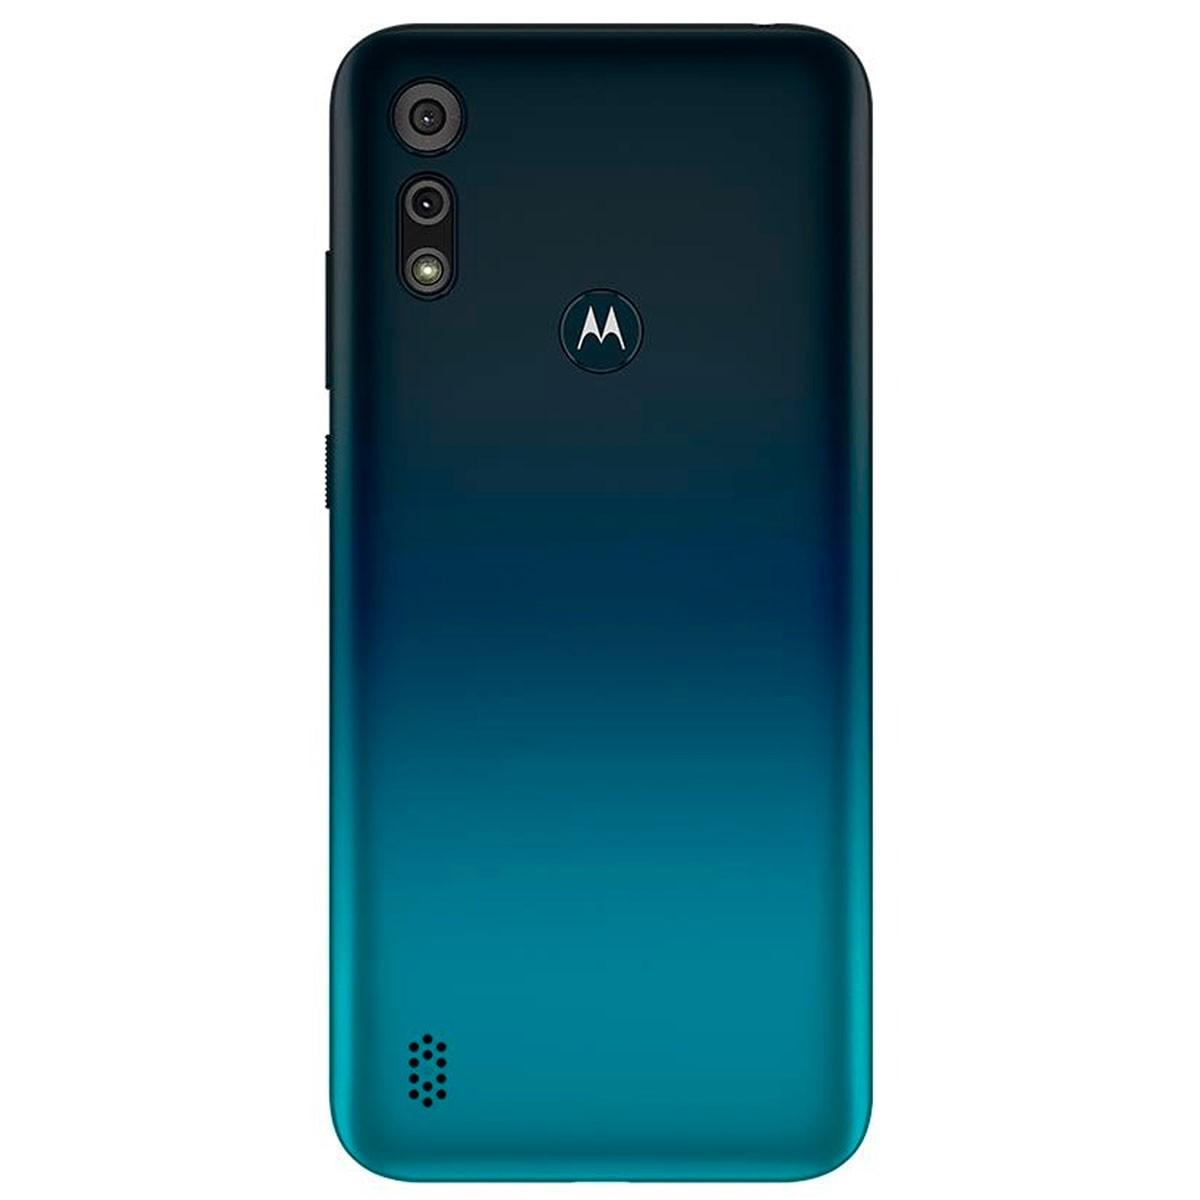 Smartphone Motorola E6s Azul Navy 32gb 2gb Ram Tela 6.1